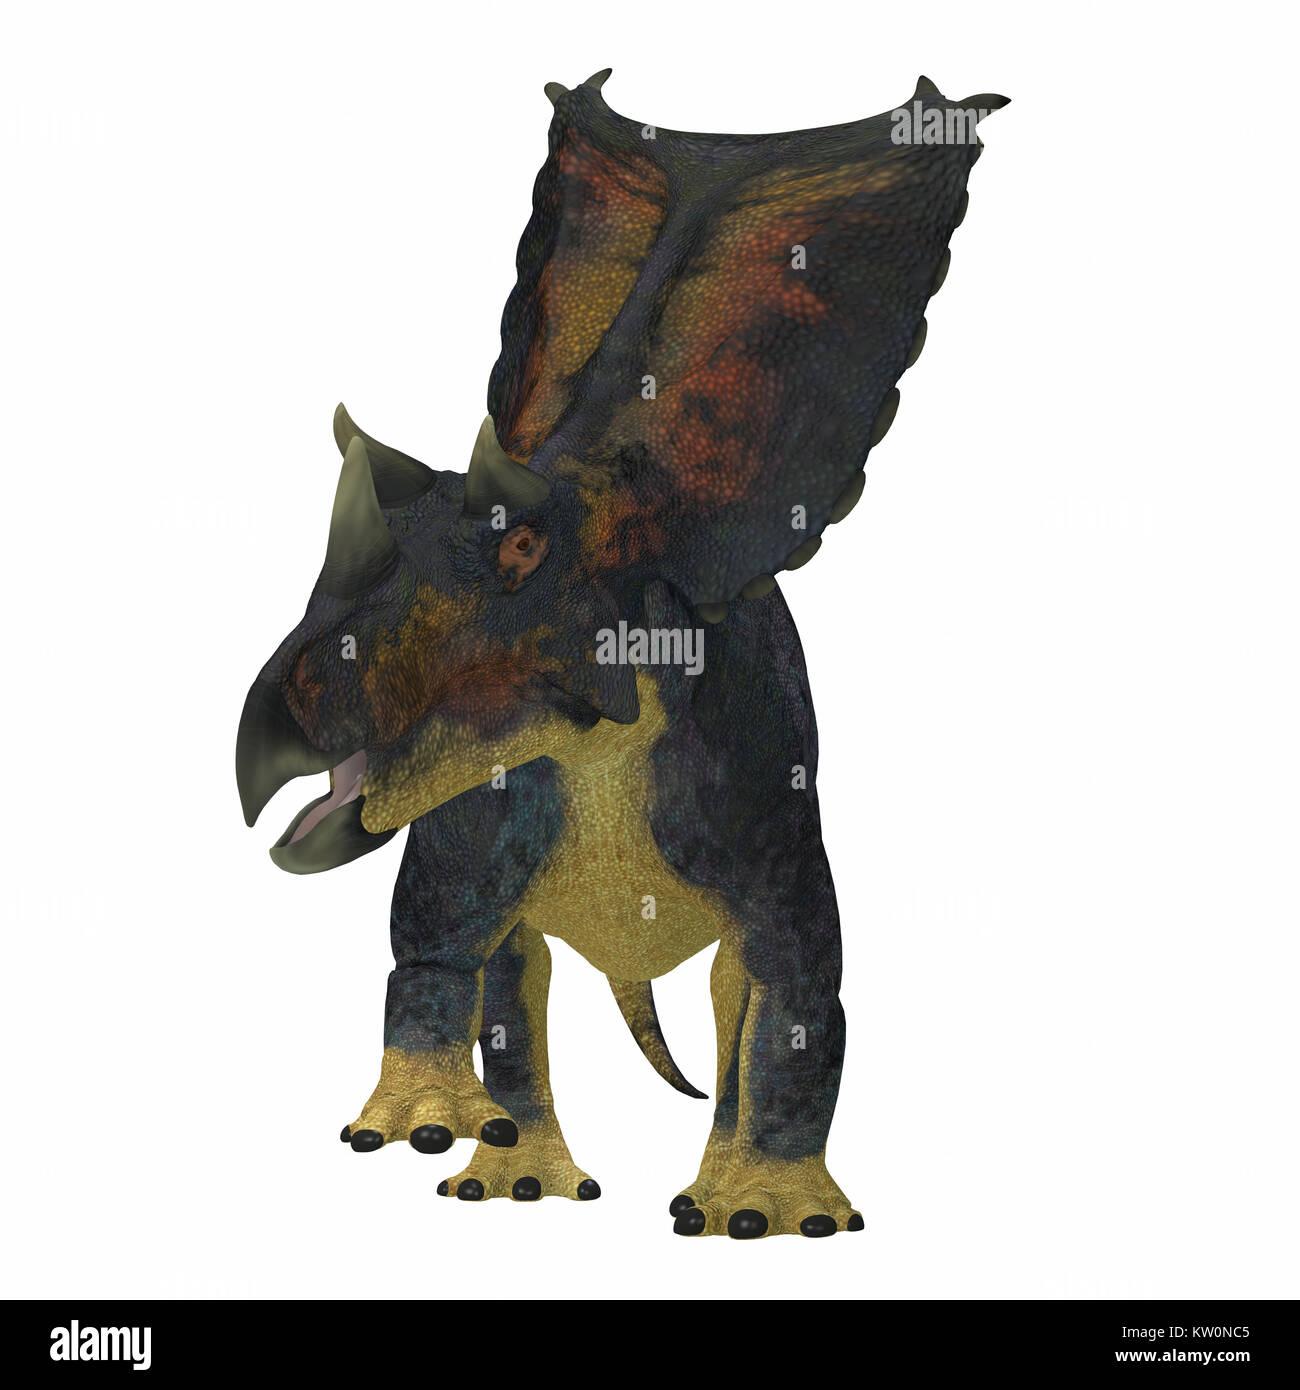 Chasmosaurus Dinosaur on White - Chasmosaurus was a herbivorous ceratopsian dinosaur that lived in Alberta, Canada - Stock Image